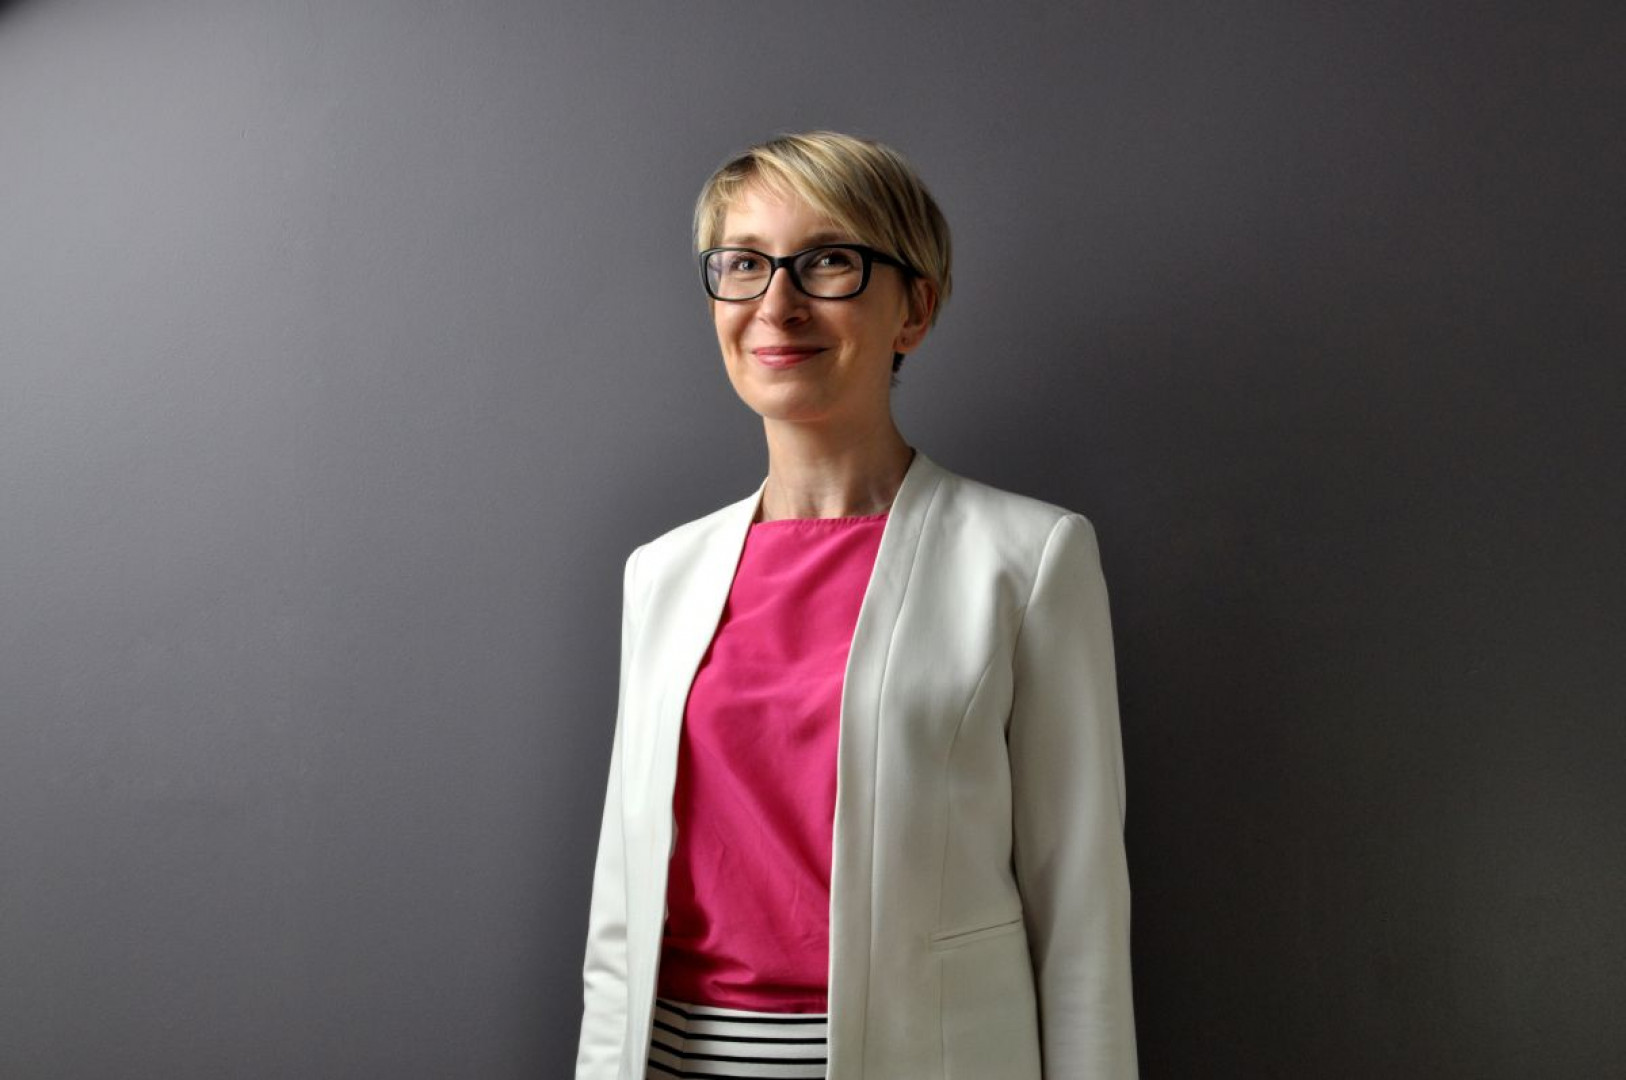 Agnieszka Ruta, kierownik Działu Marketingu firmy Gamet. Fot. Gamet